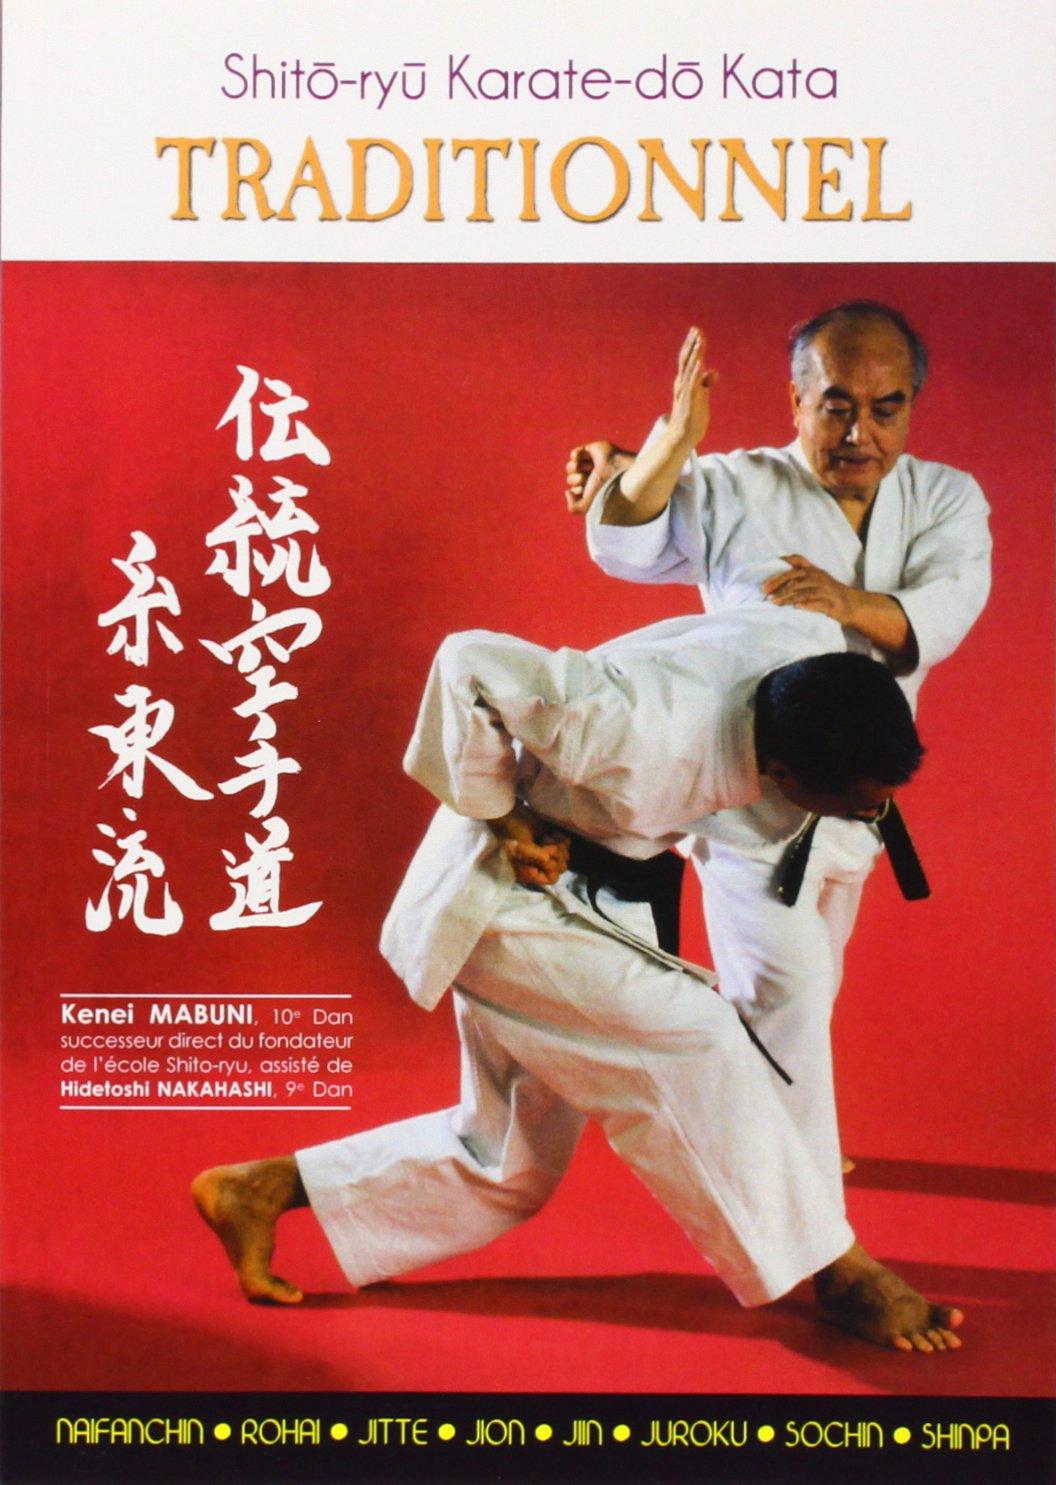 shito ryu karate do kata traditionnel amazon co uk kenei mabuni rh amazon co uk James Davenport Chito Ryu Karate Chito-Ryu Kata